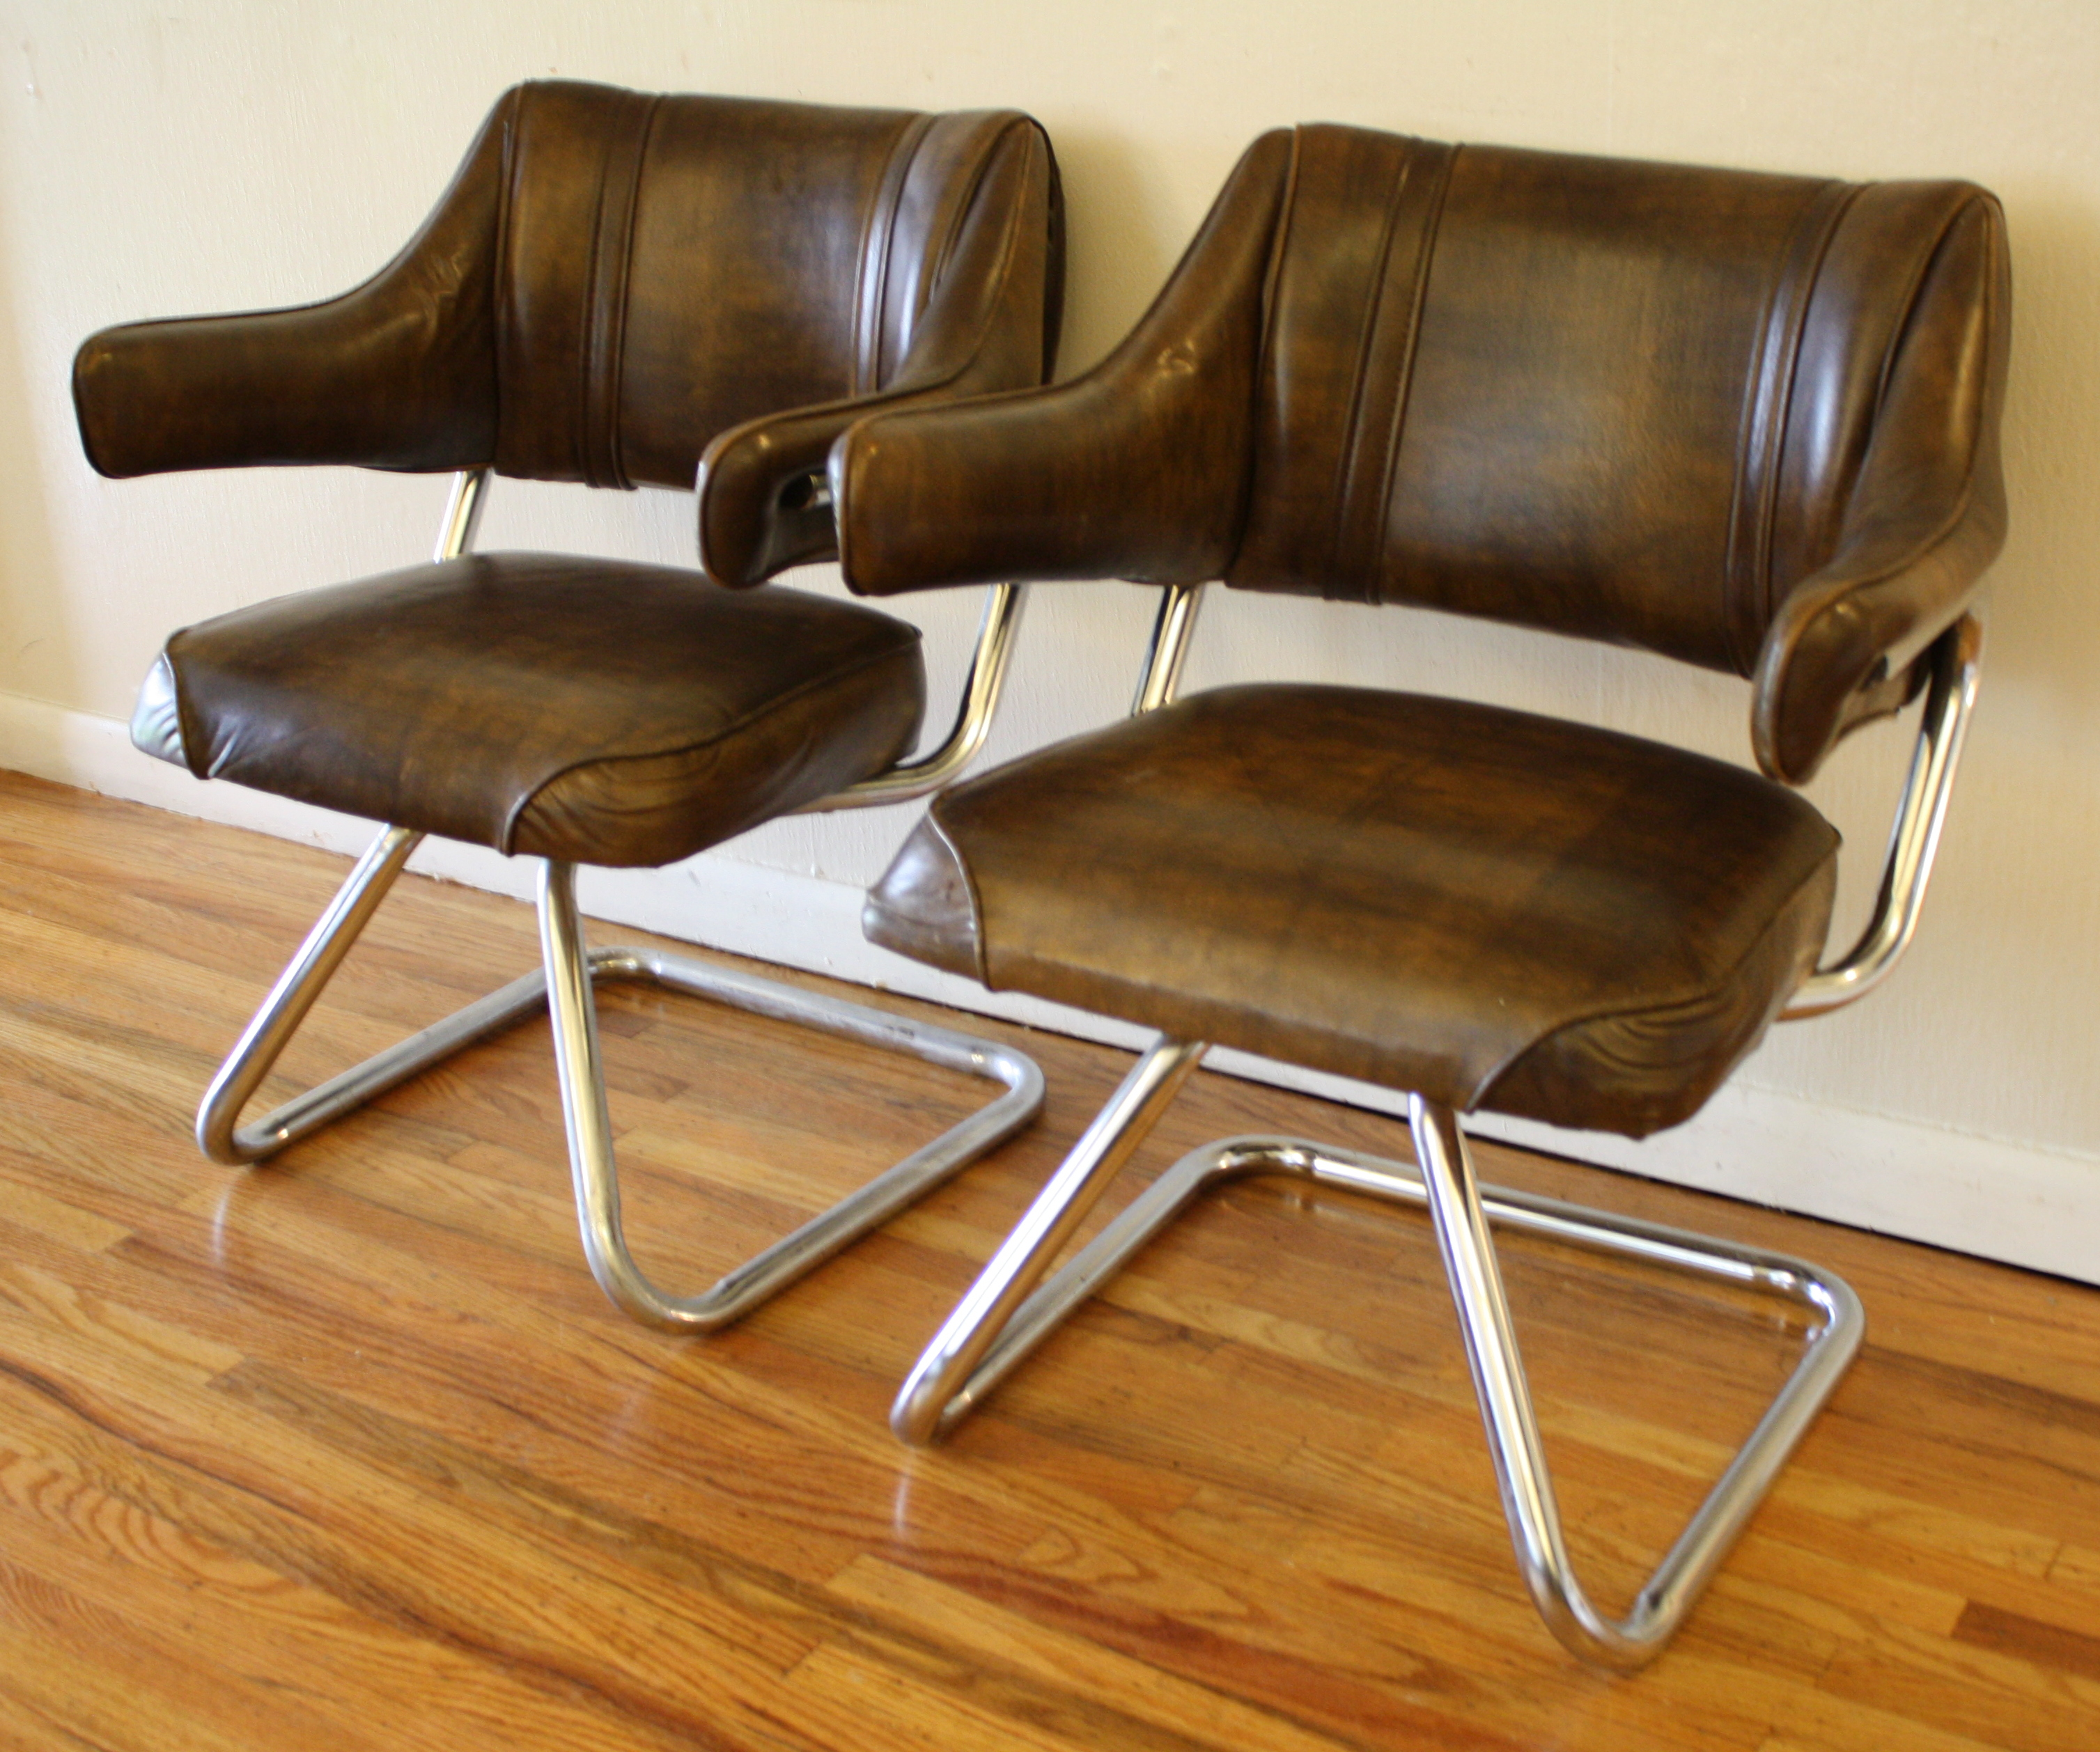 retro chrome chairs 1 picked vintage